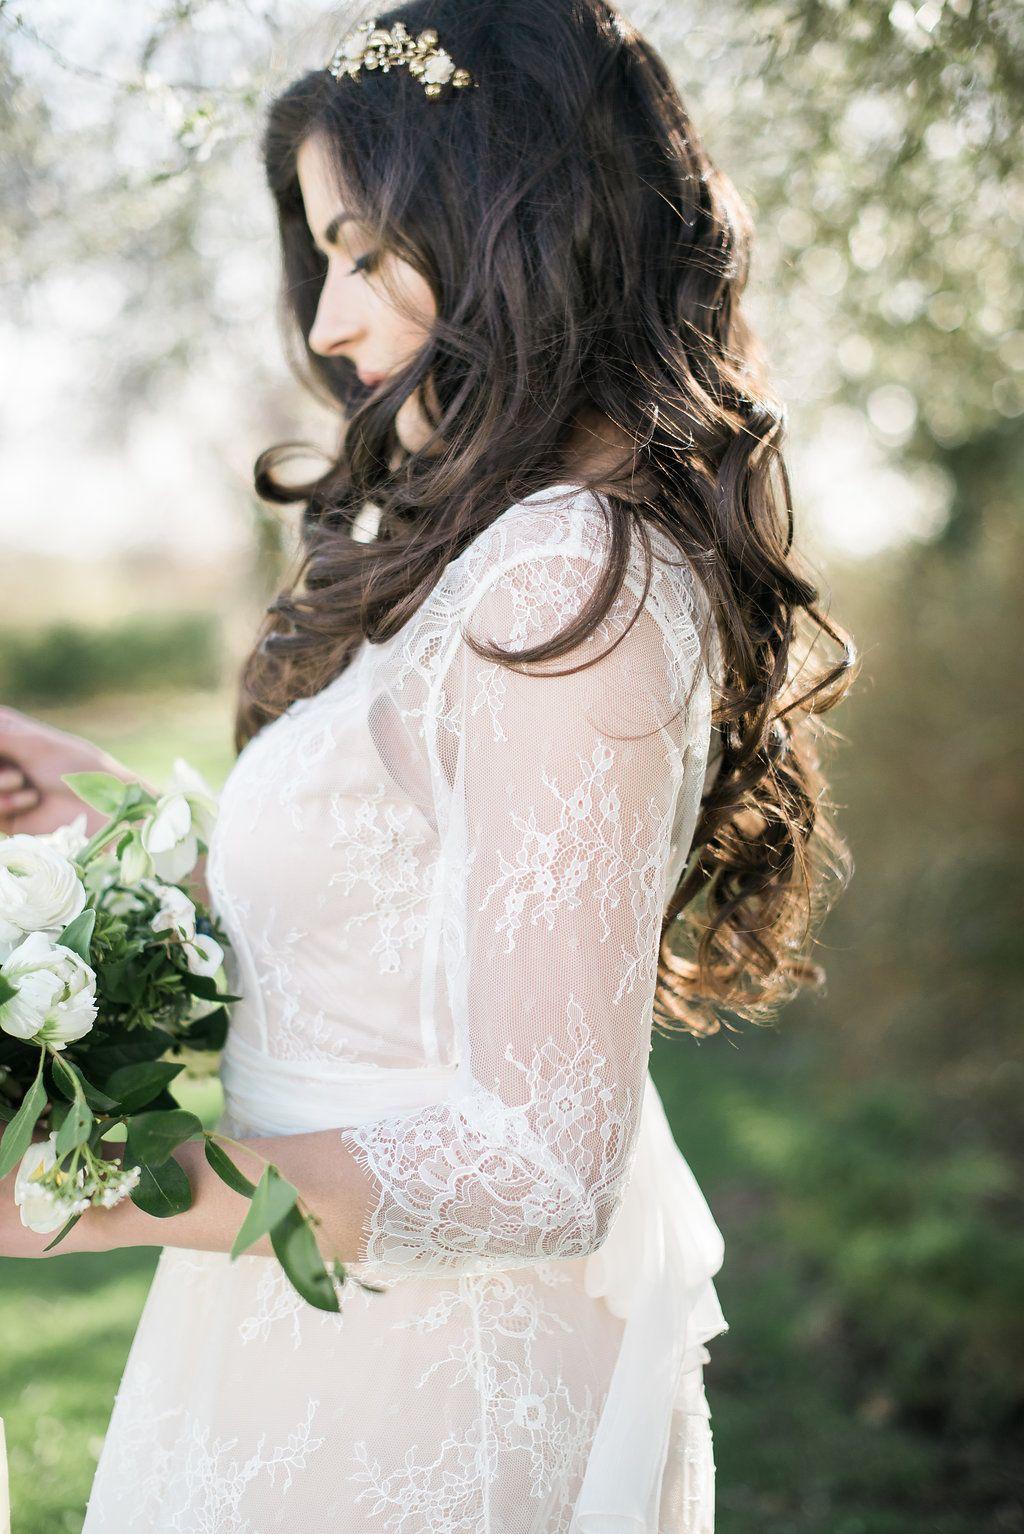 Sadoni wedding dress from Caroline Clark Bridal Boutique, Droitwich ...